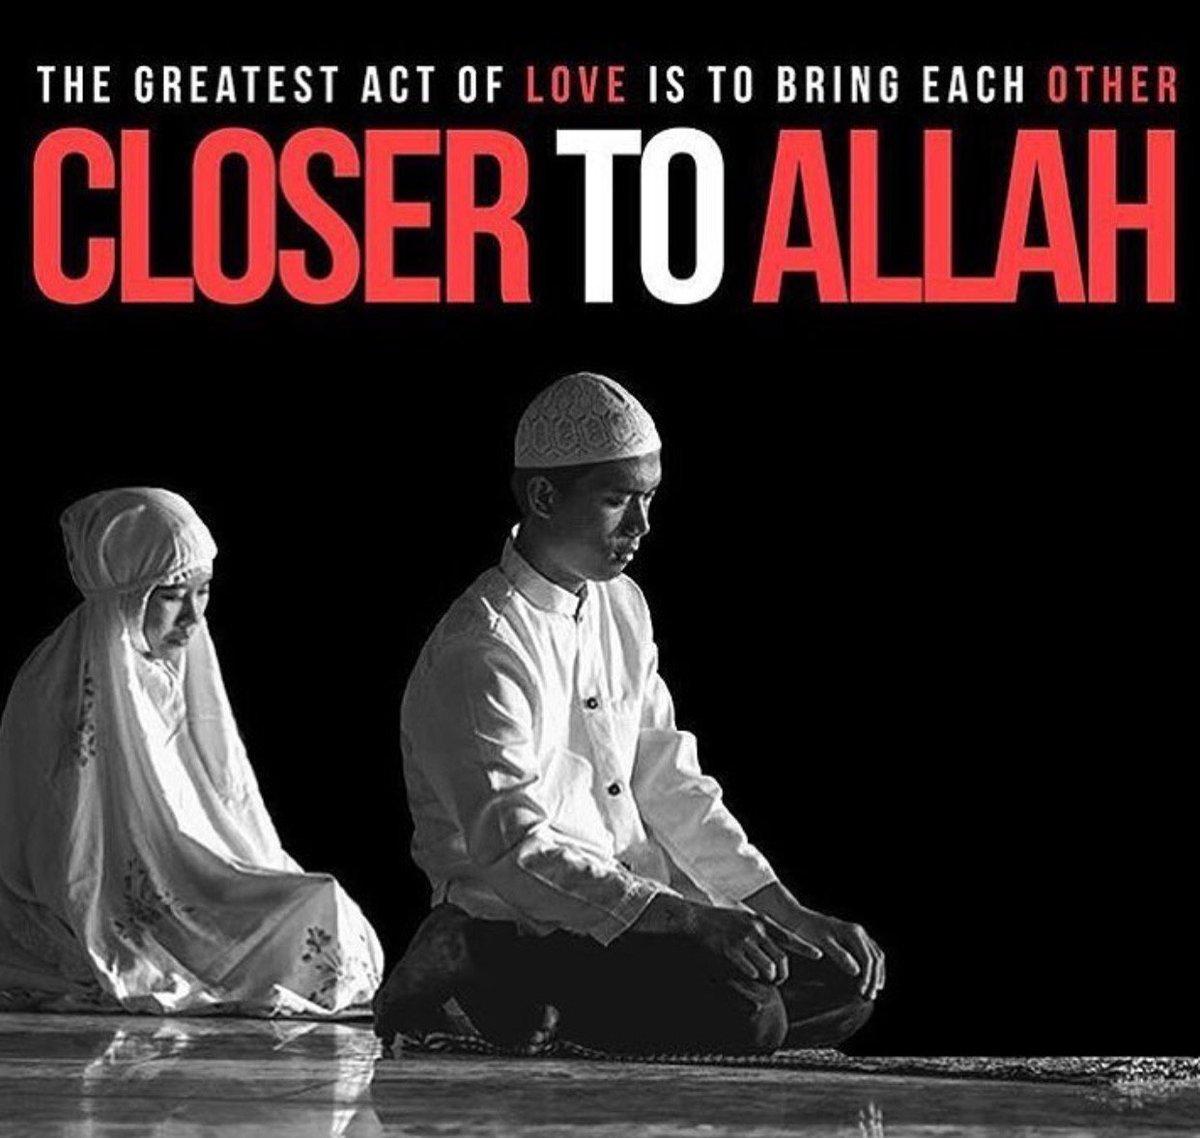 #truelove #Allah https://t.co/JpMNqf6B4R